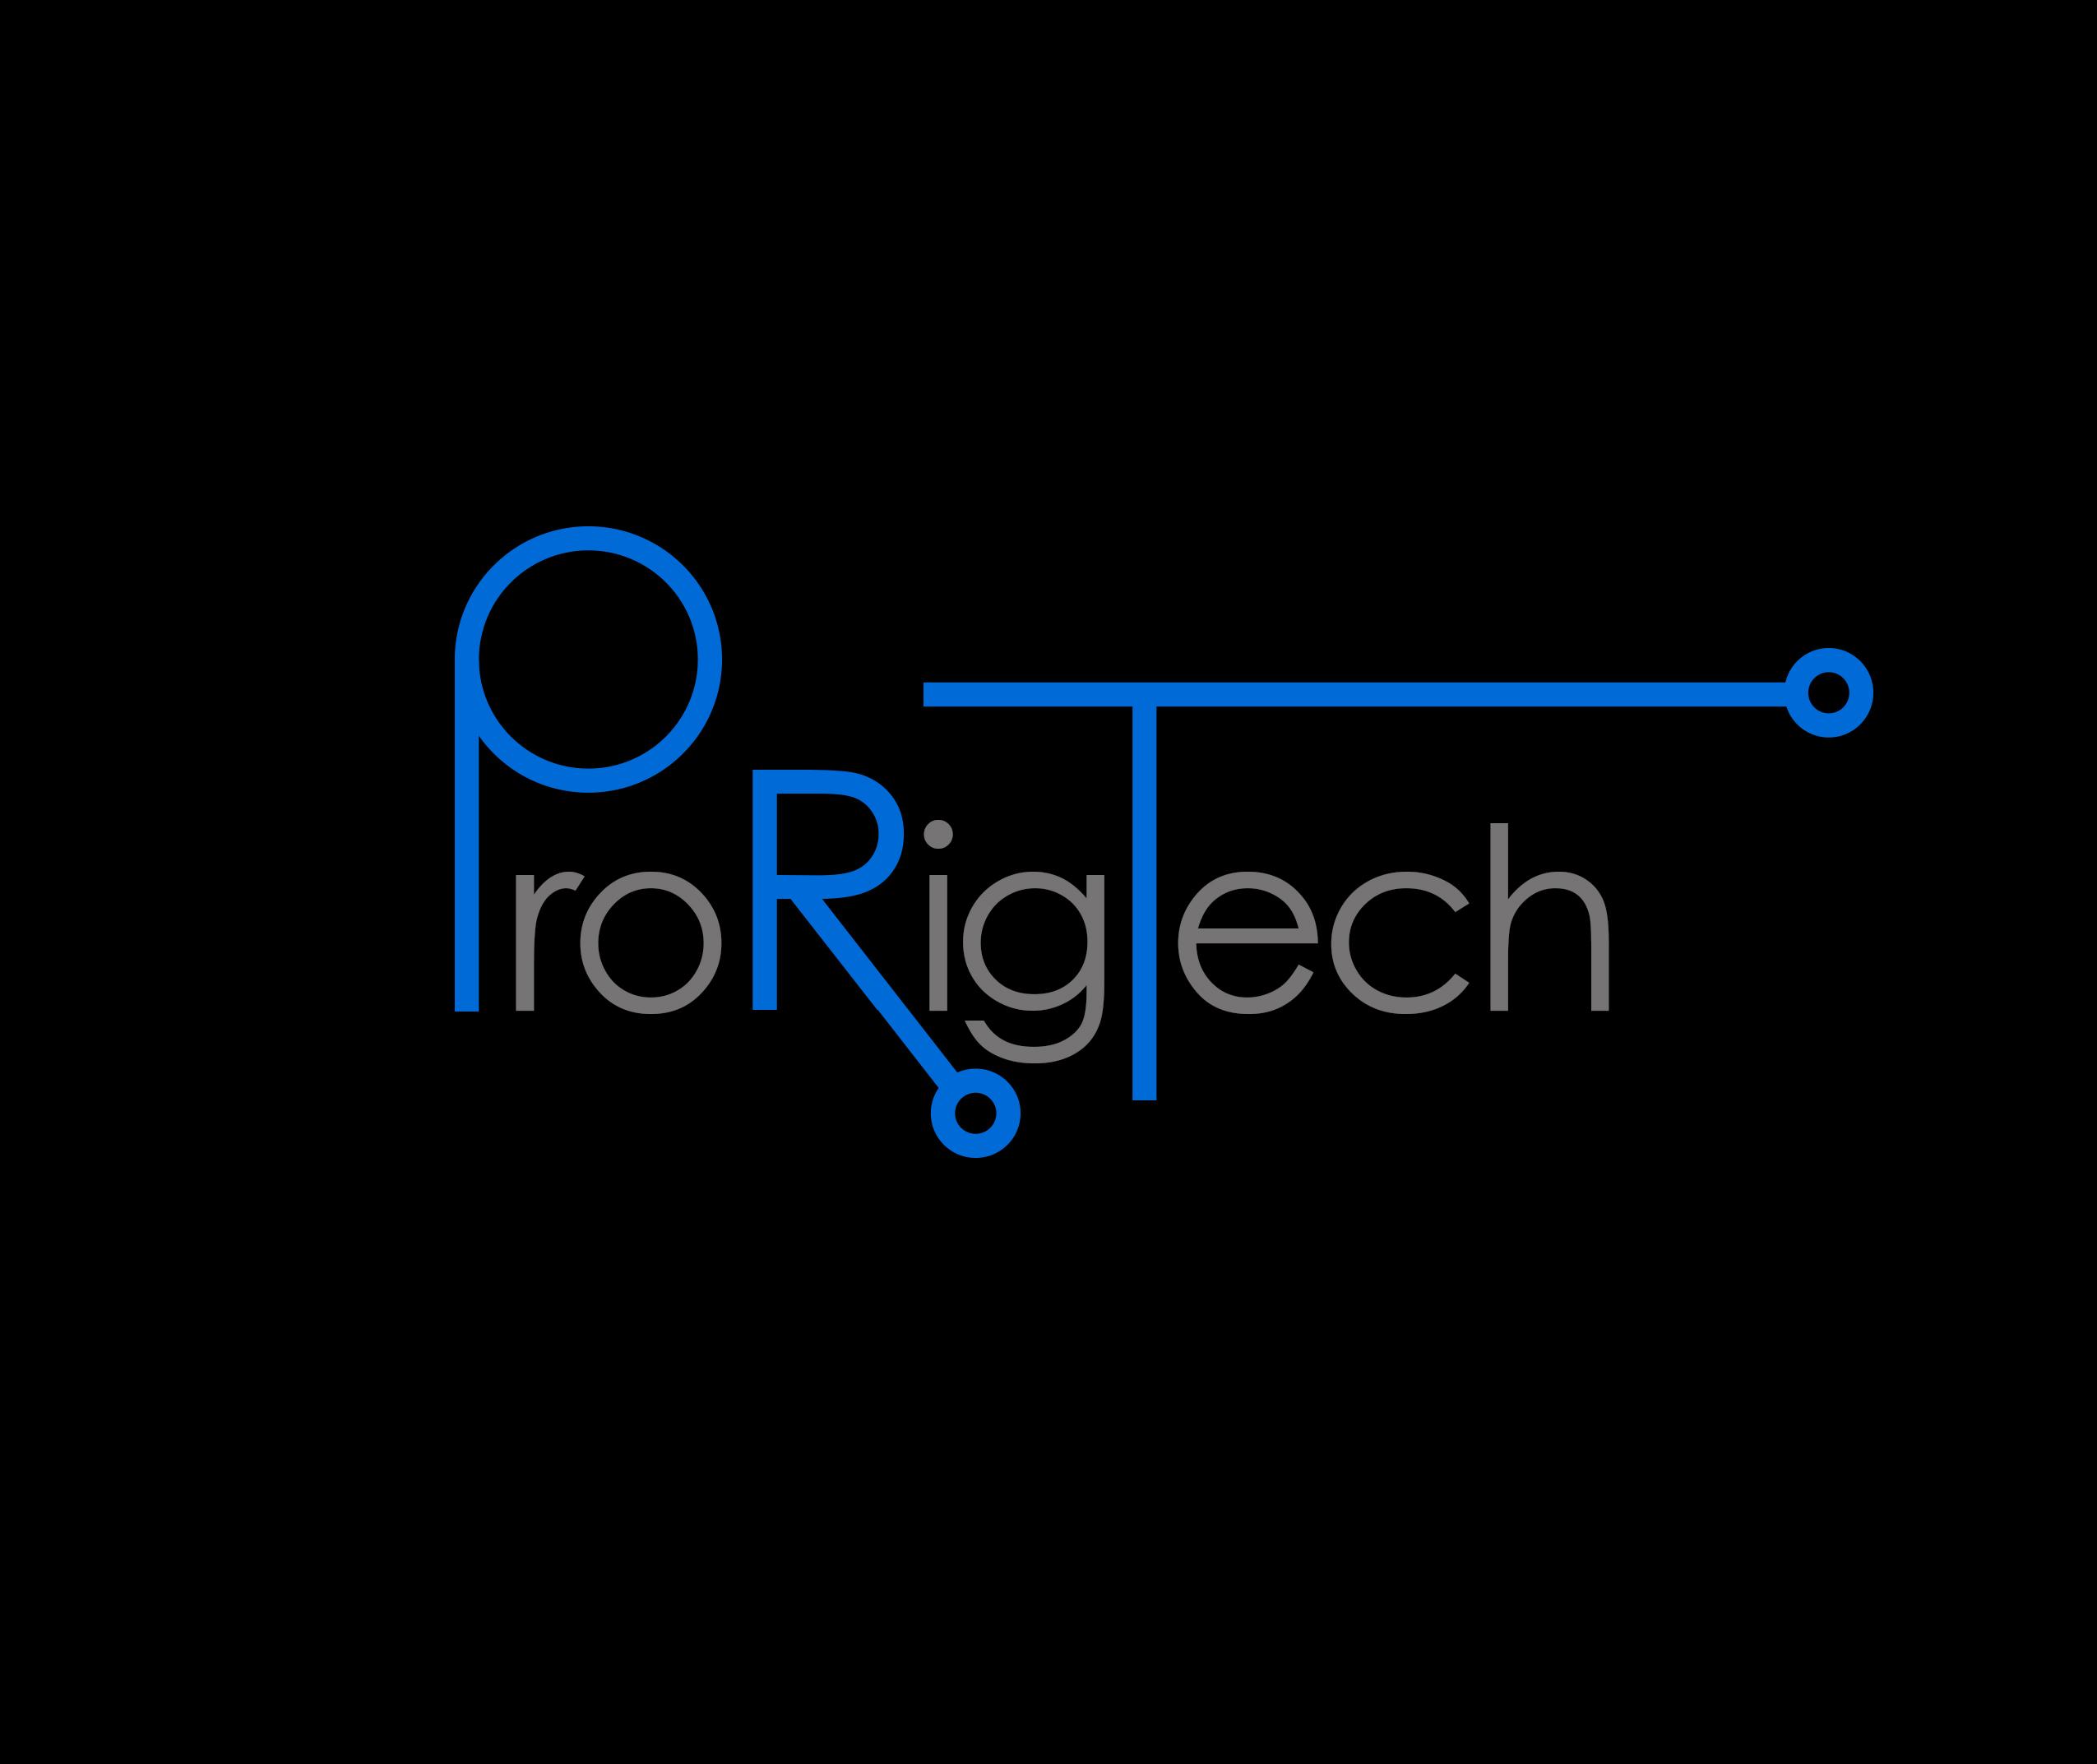 Production Rigging Technologies LLC